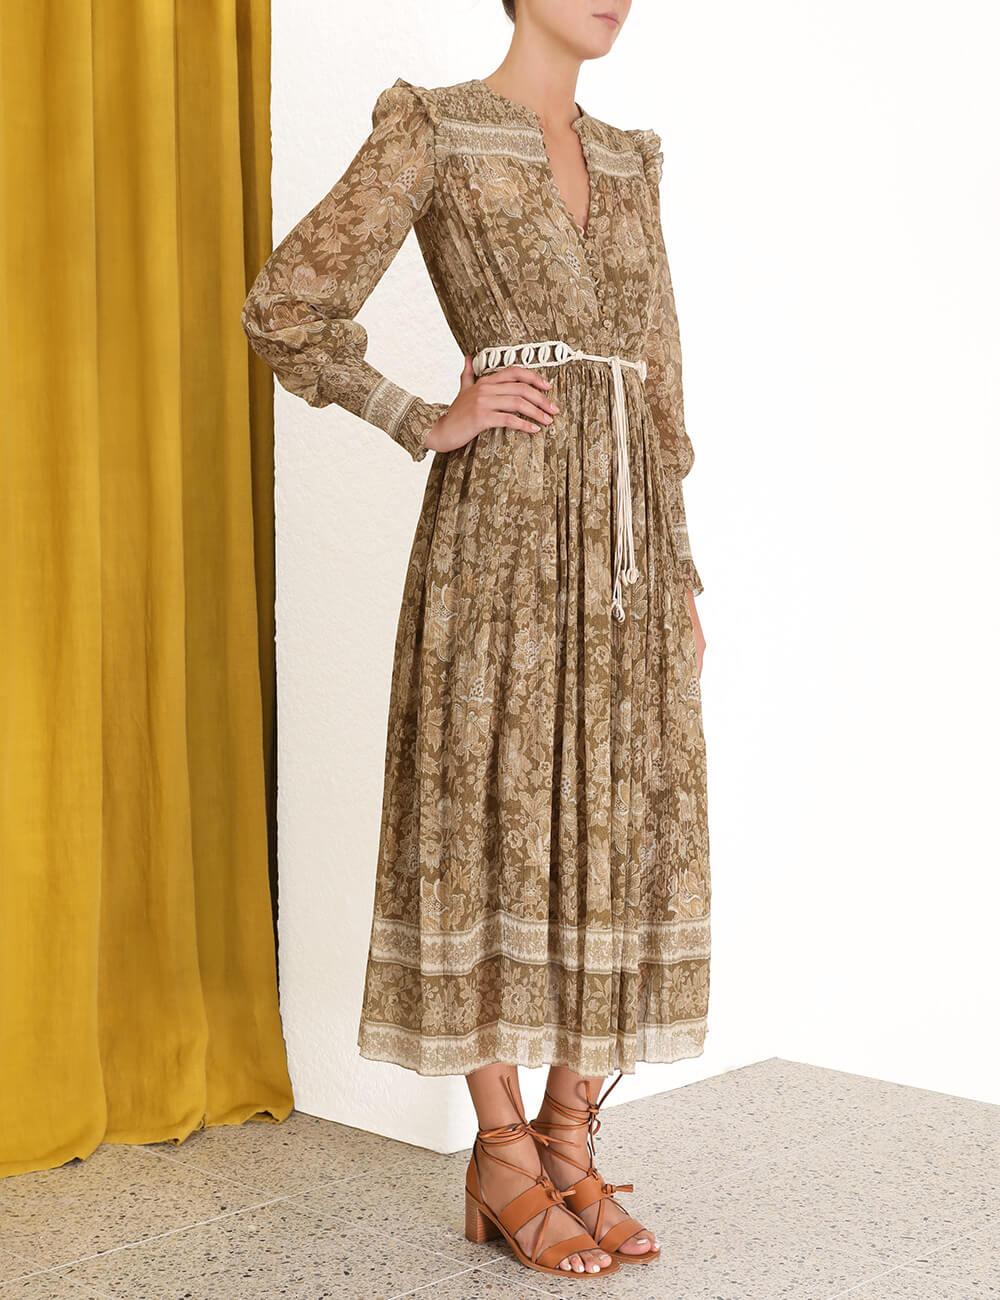 Veneto Shirred Paisley Dress